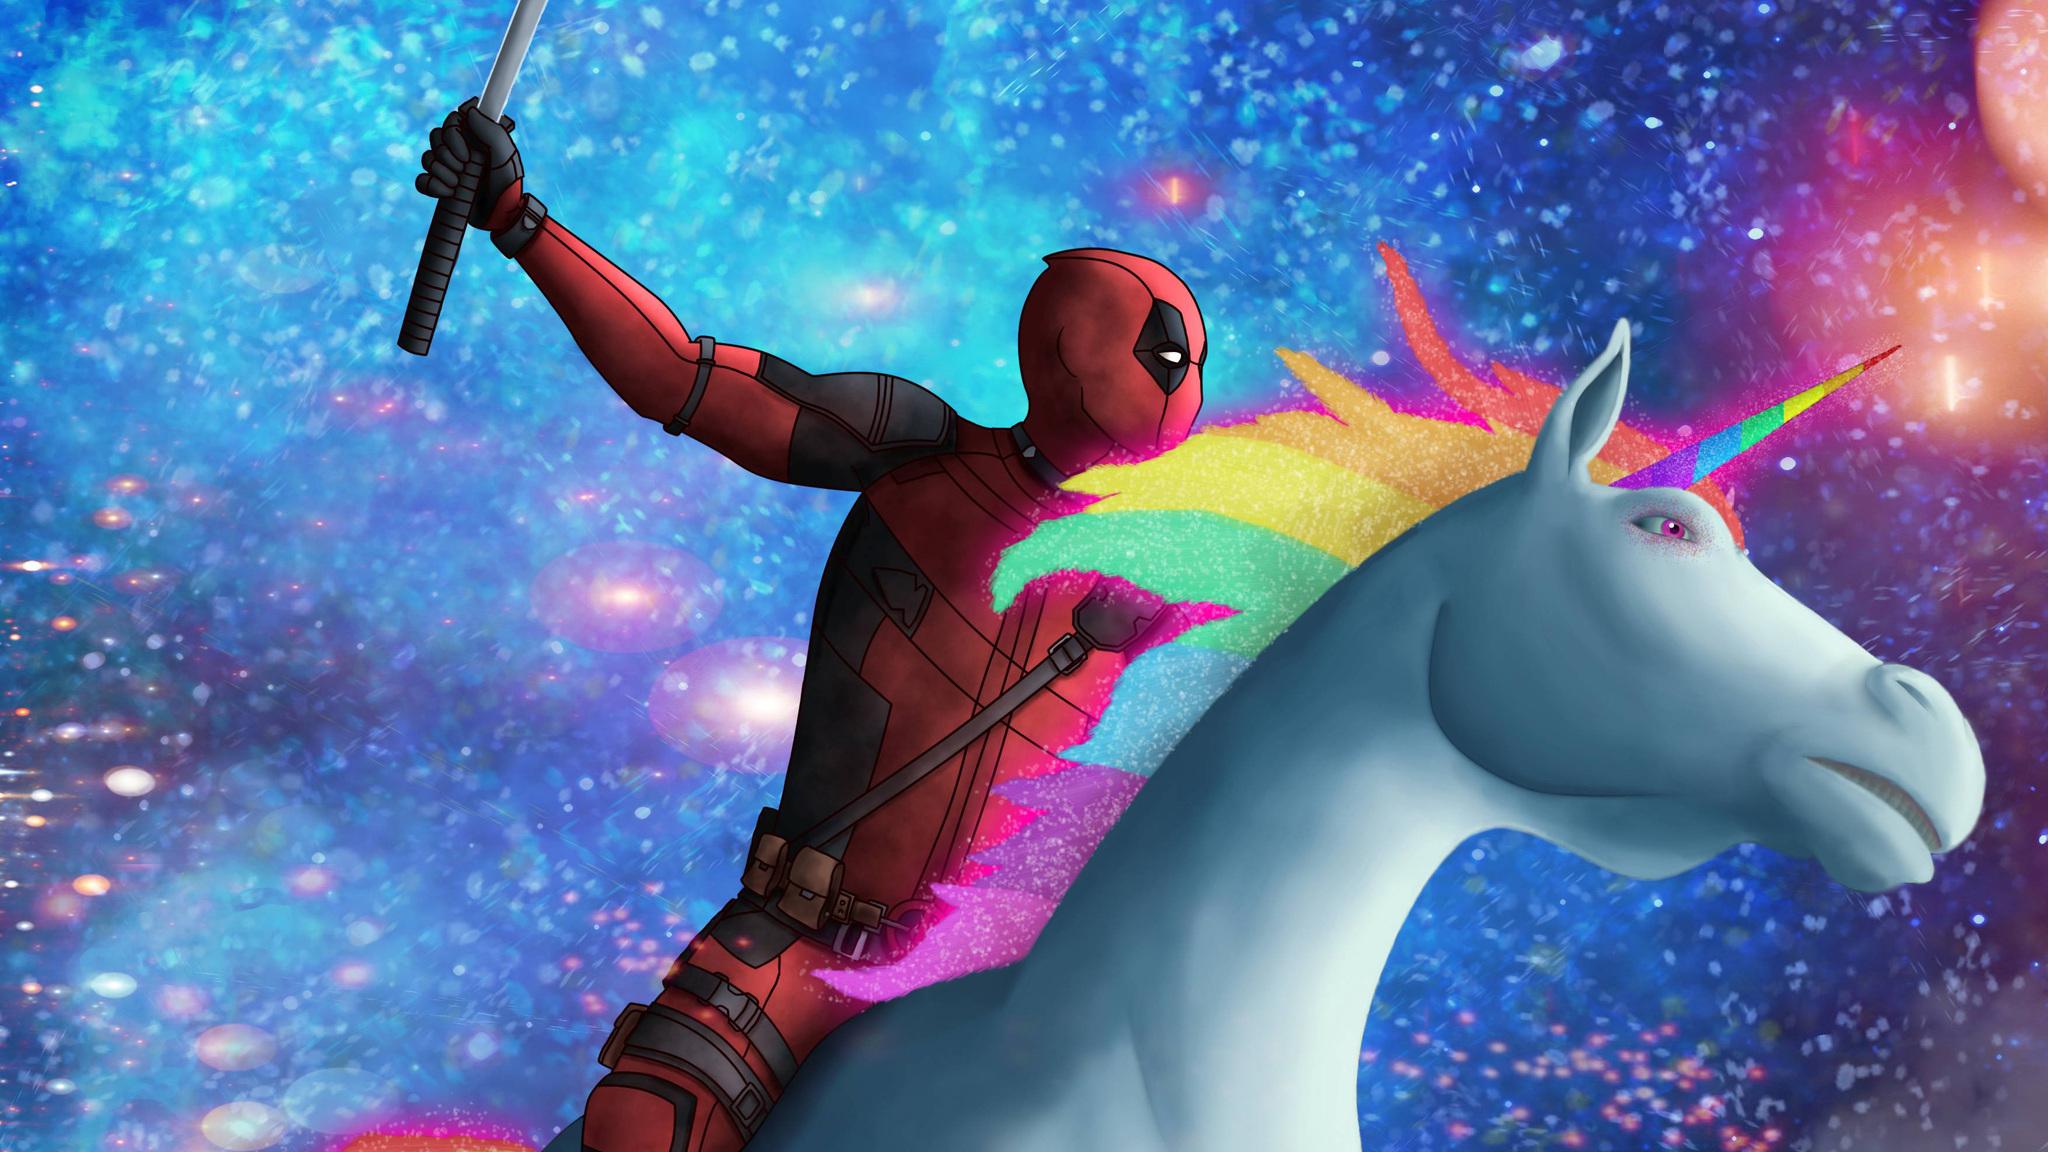 2048x1152 Deadpool On Unicorn 2048x1152 Resolution Hd 4k Wallpapers